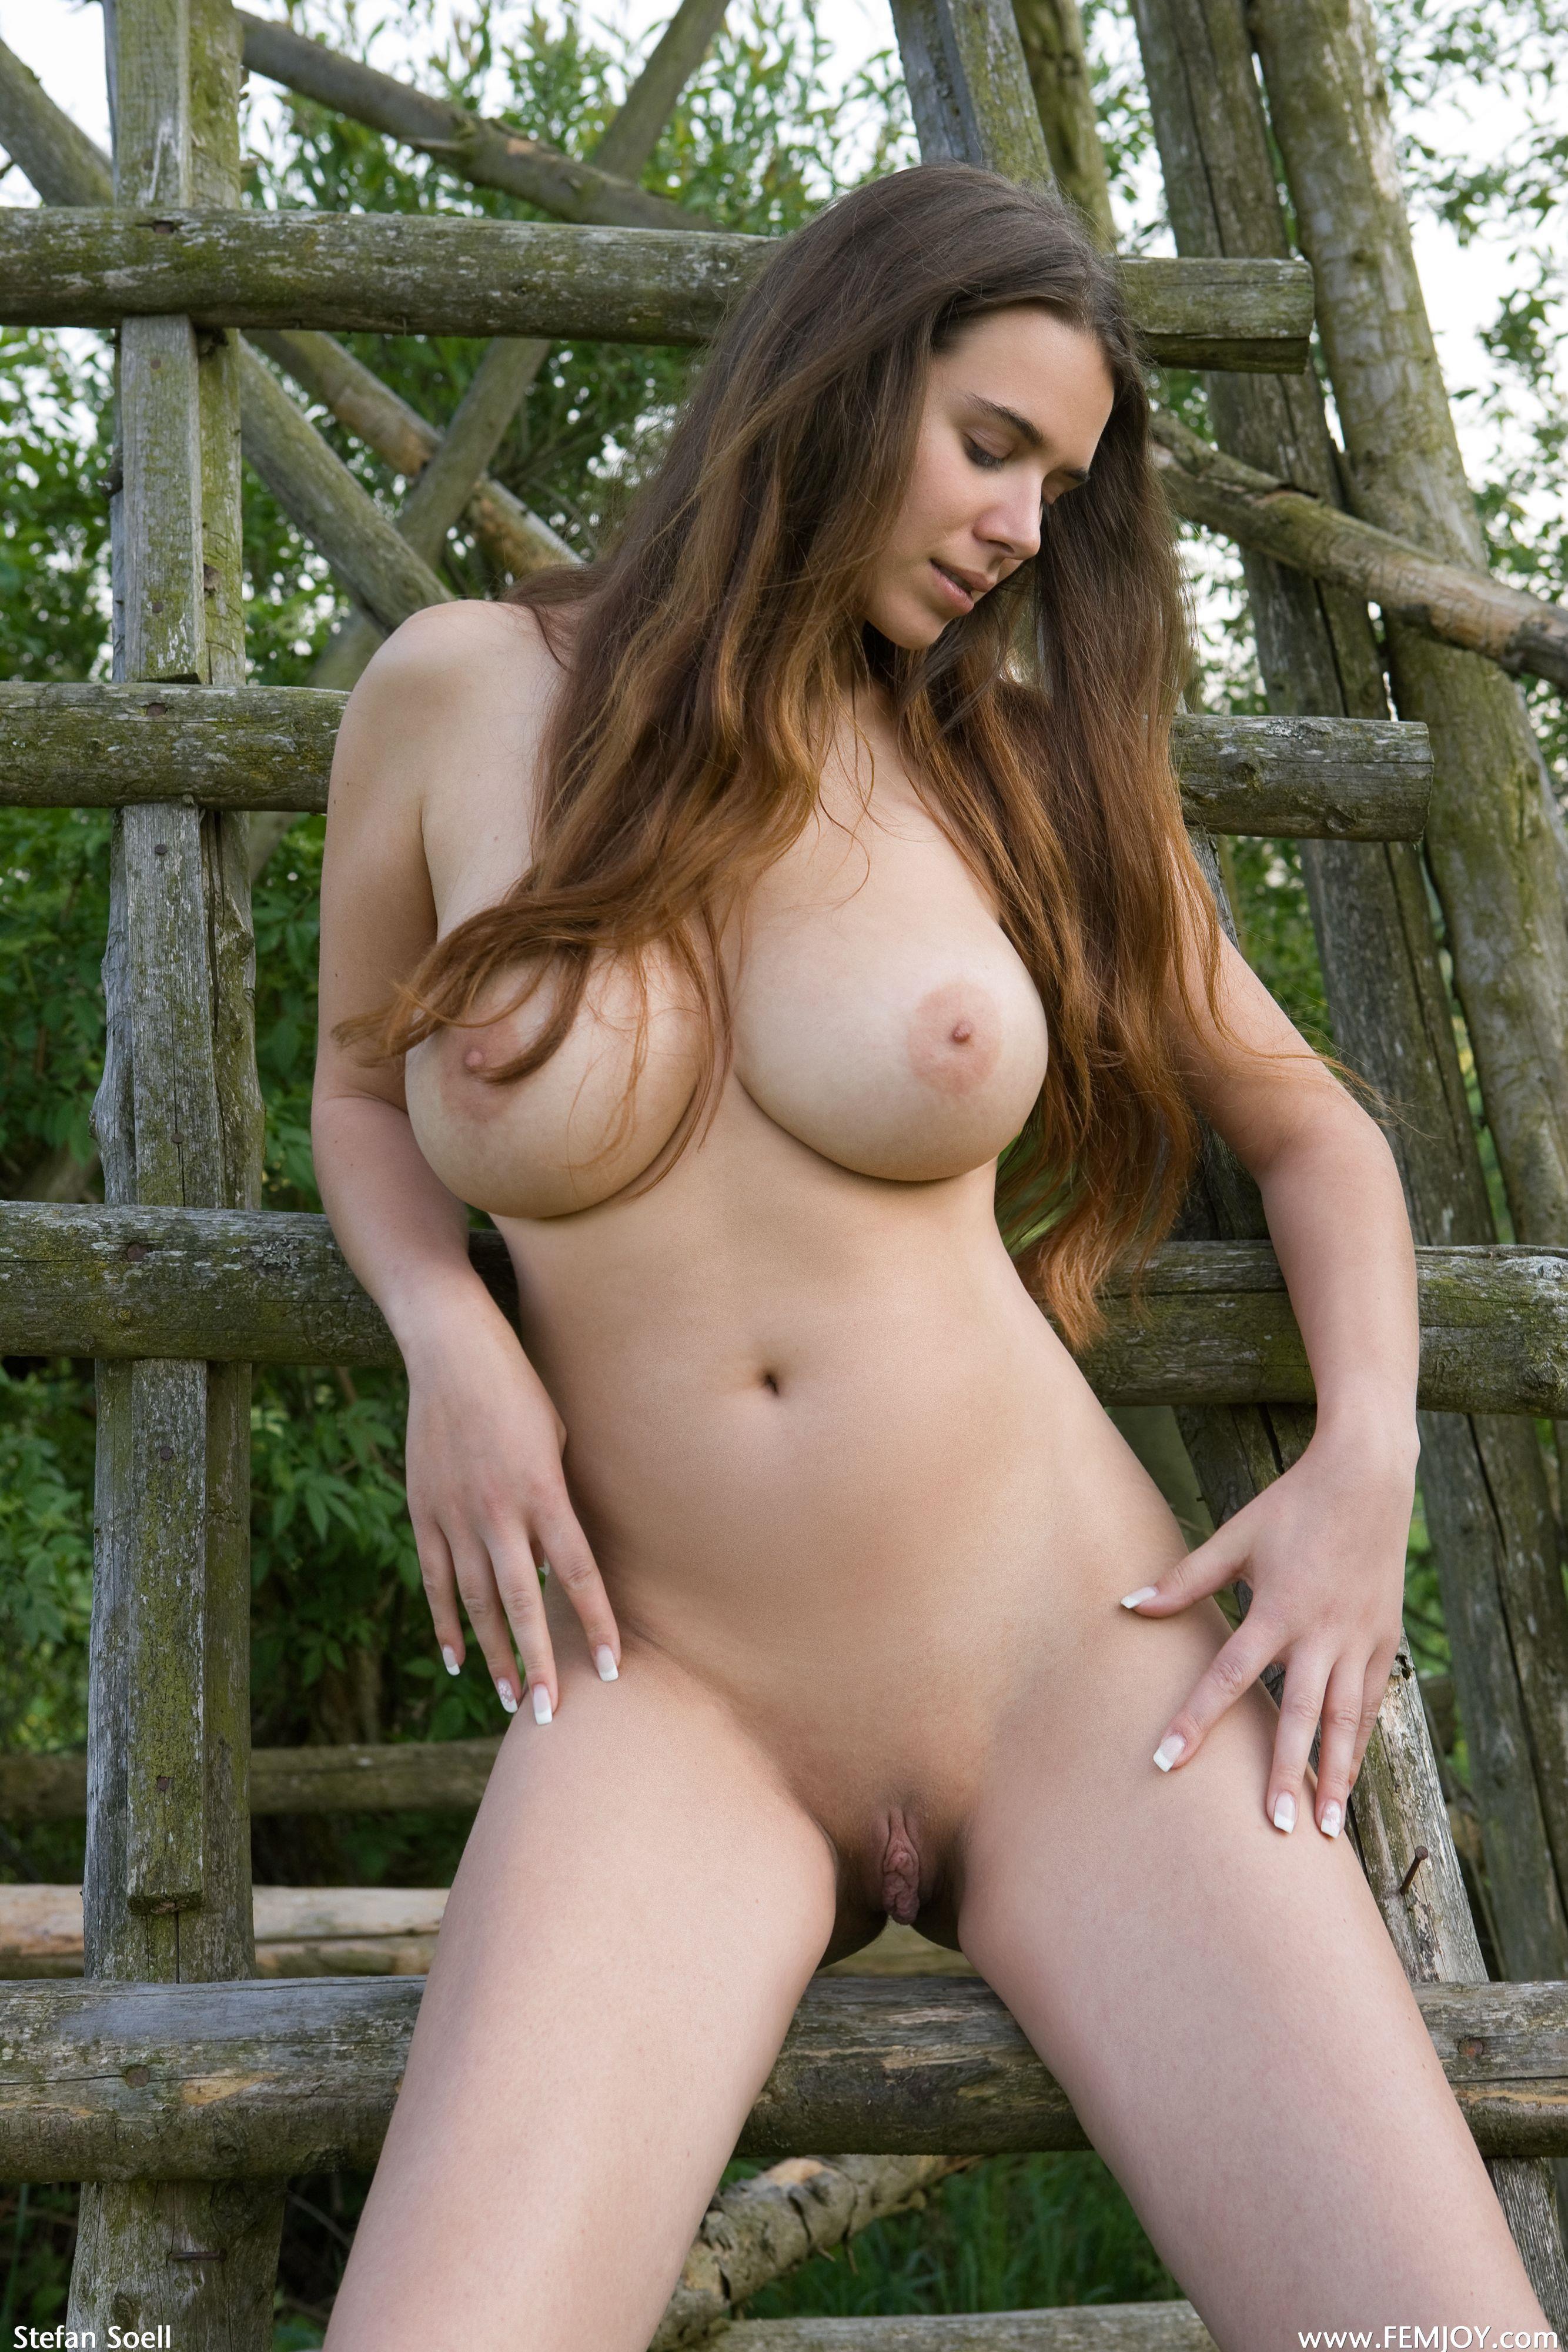 pornhub girls nude pics